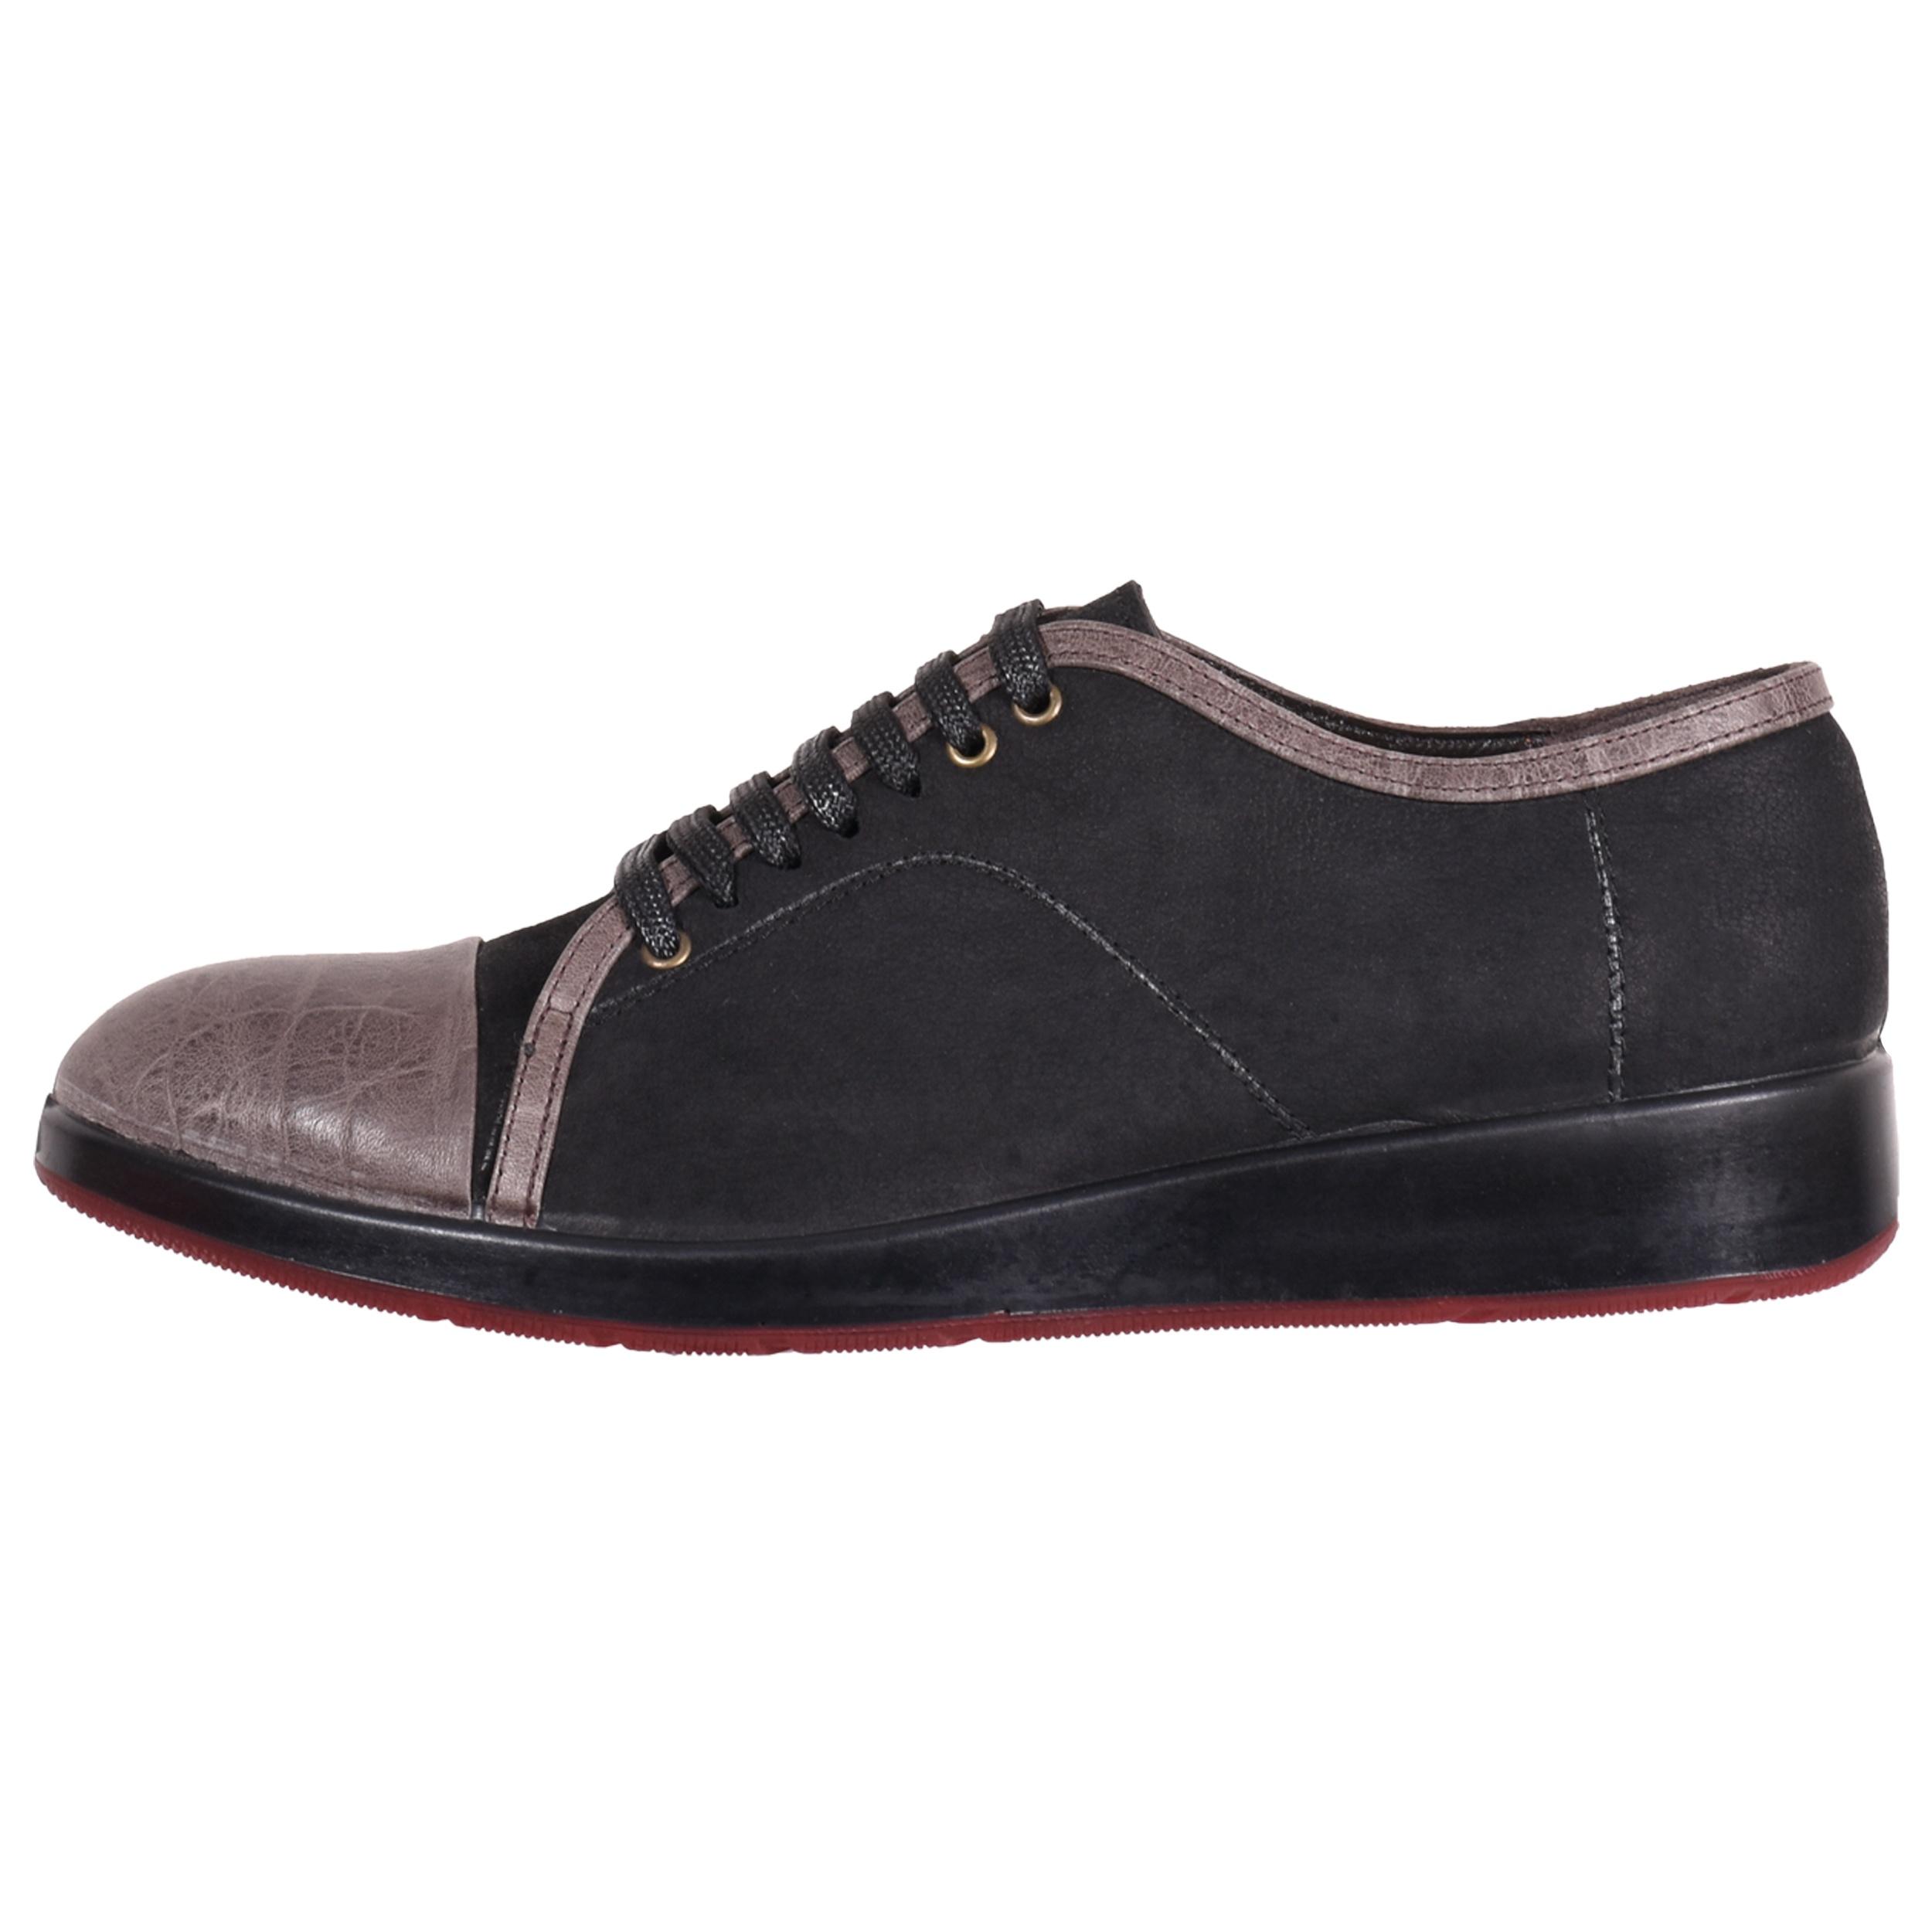 قیمت خرید کفش روزمره مردانه کد 1-39630 اورجینال